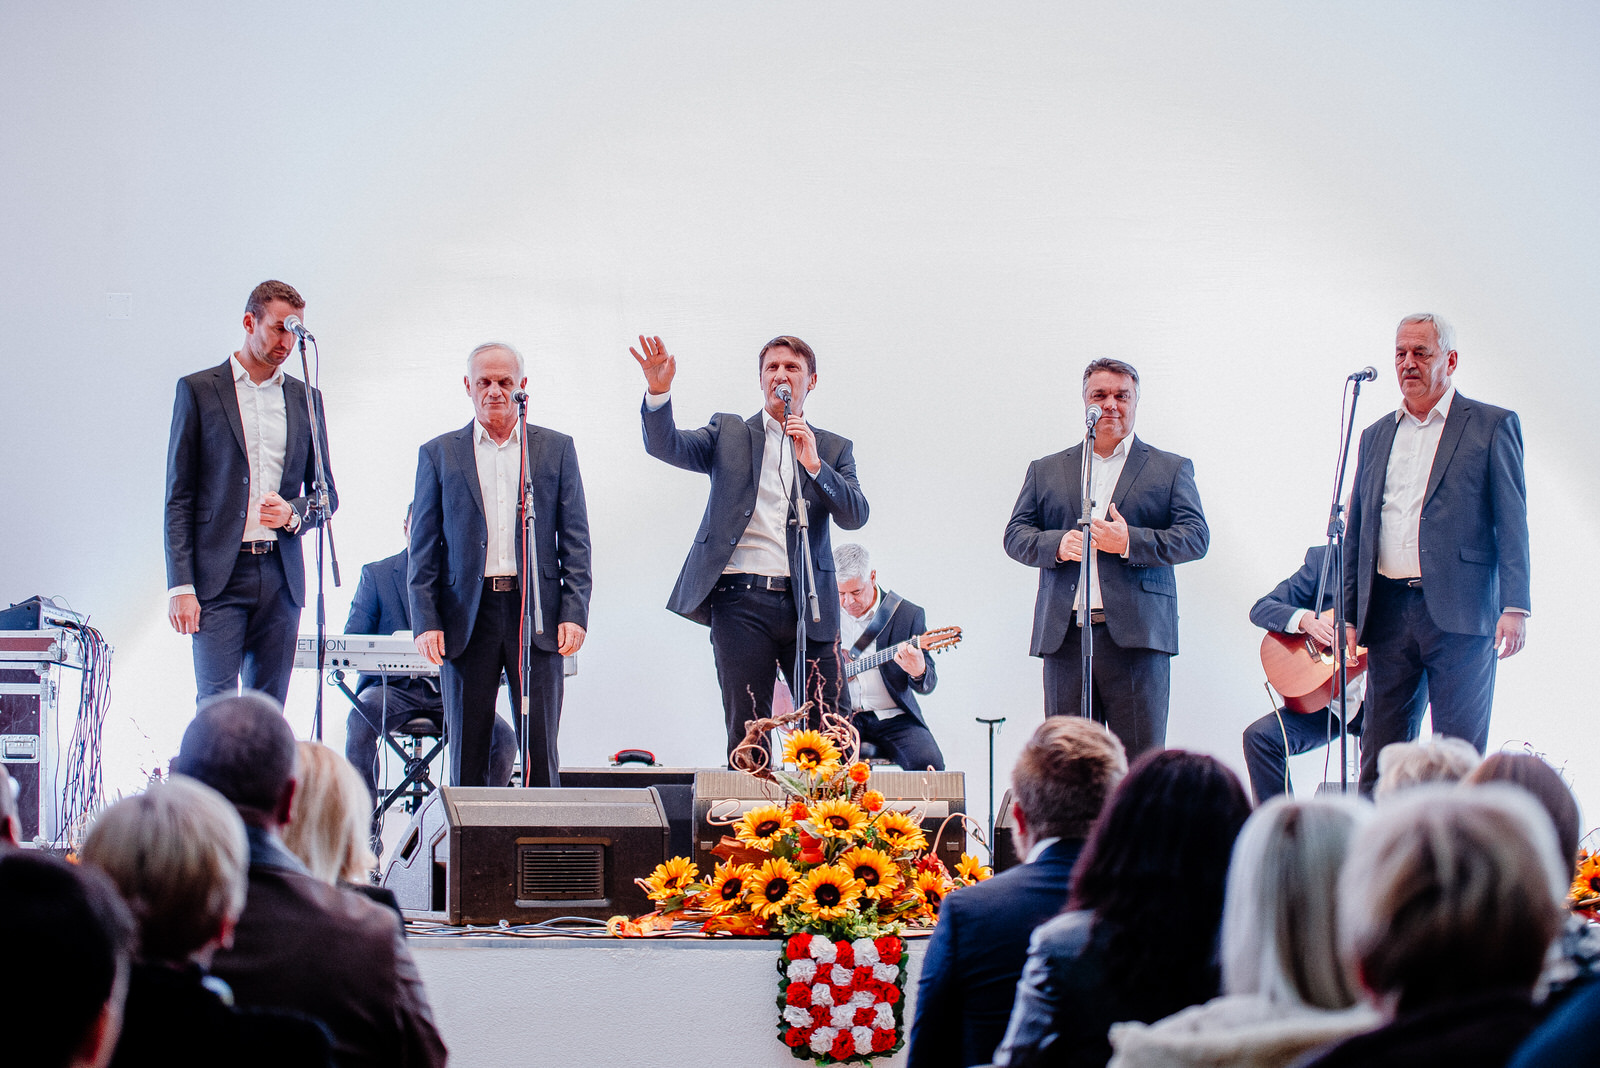 likaclub_korenica_klapa-intrade_dan-neovisnosti_2019-17